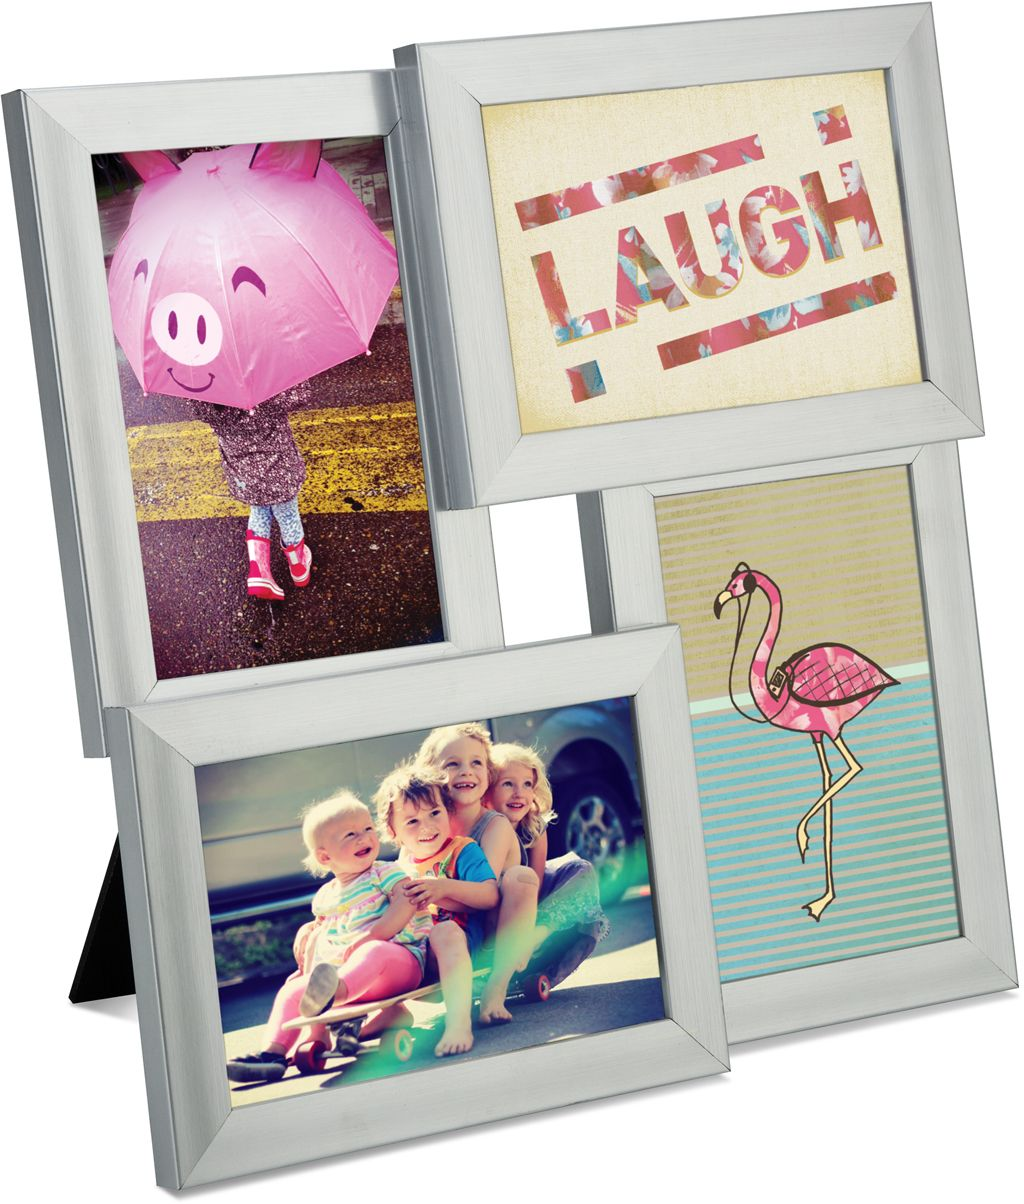 Pane Multi Frame fotolijst - Umbra   Fotolijsten   Pinterest